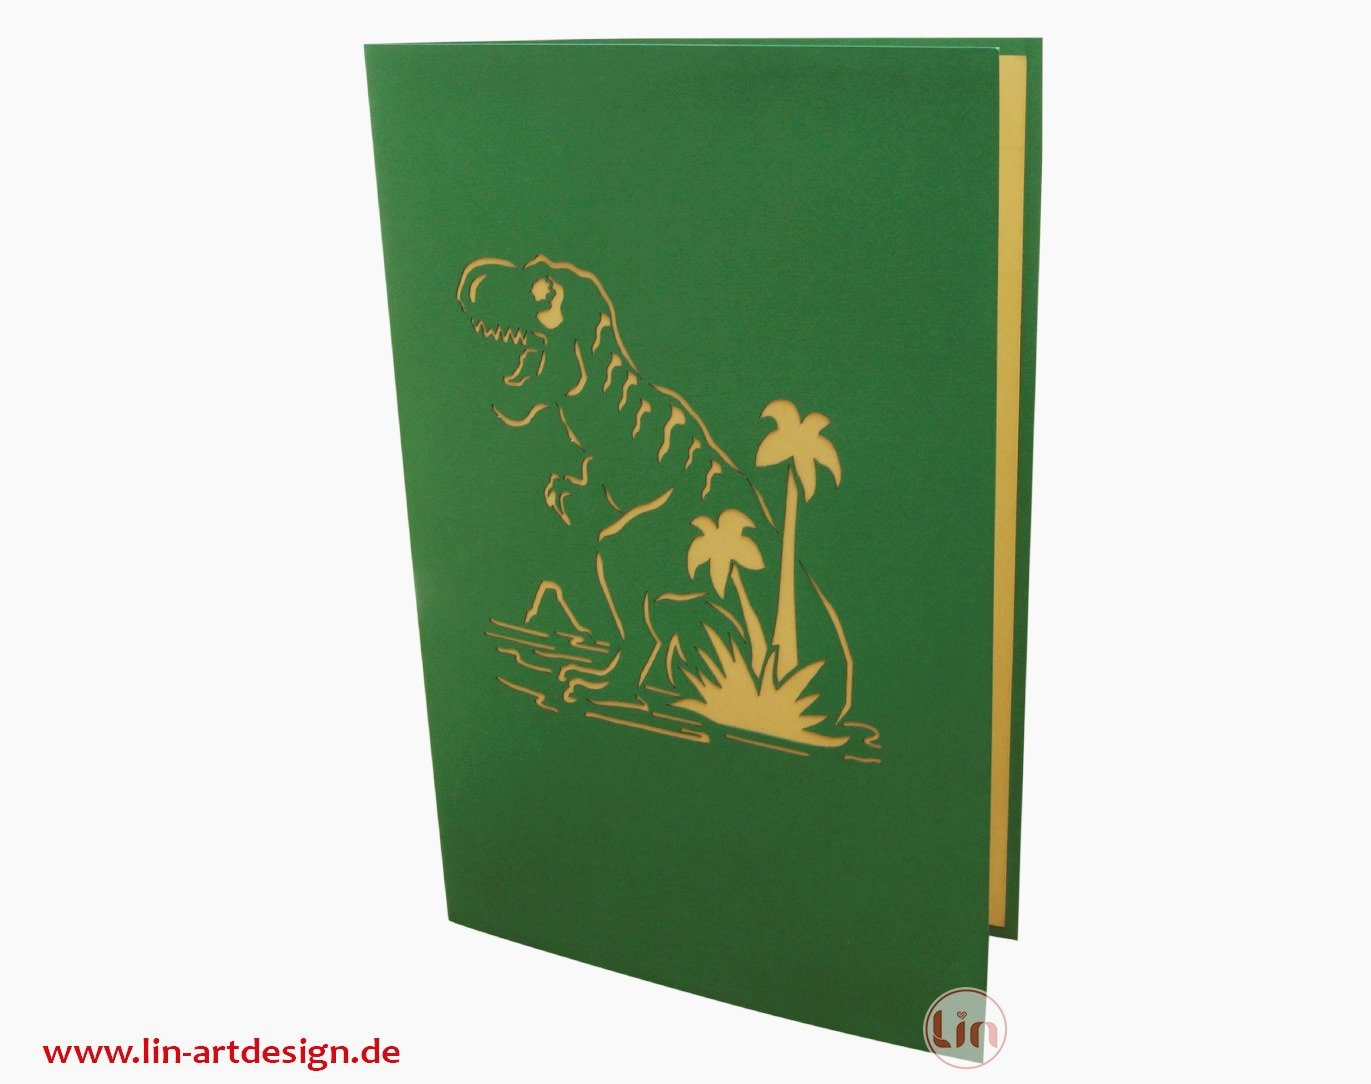 Lin 17538/ /Pop Up 3D cartes de v/œux Dino cartes carte danniversaire dinosaure 3D pop up Cartes Carte danniversaire einschulung n292